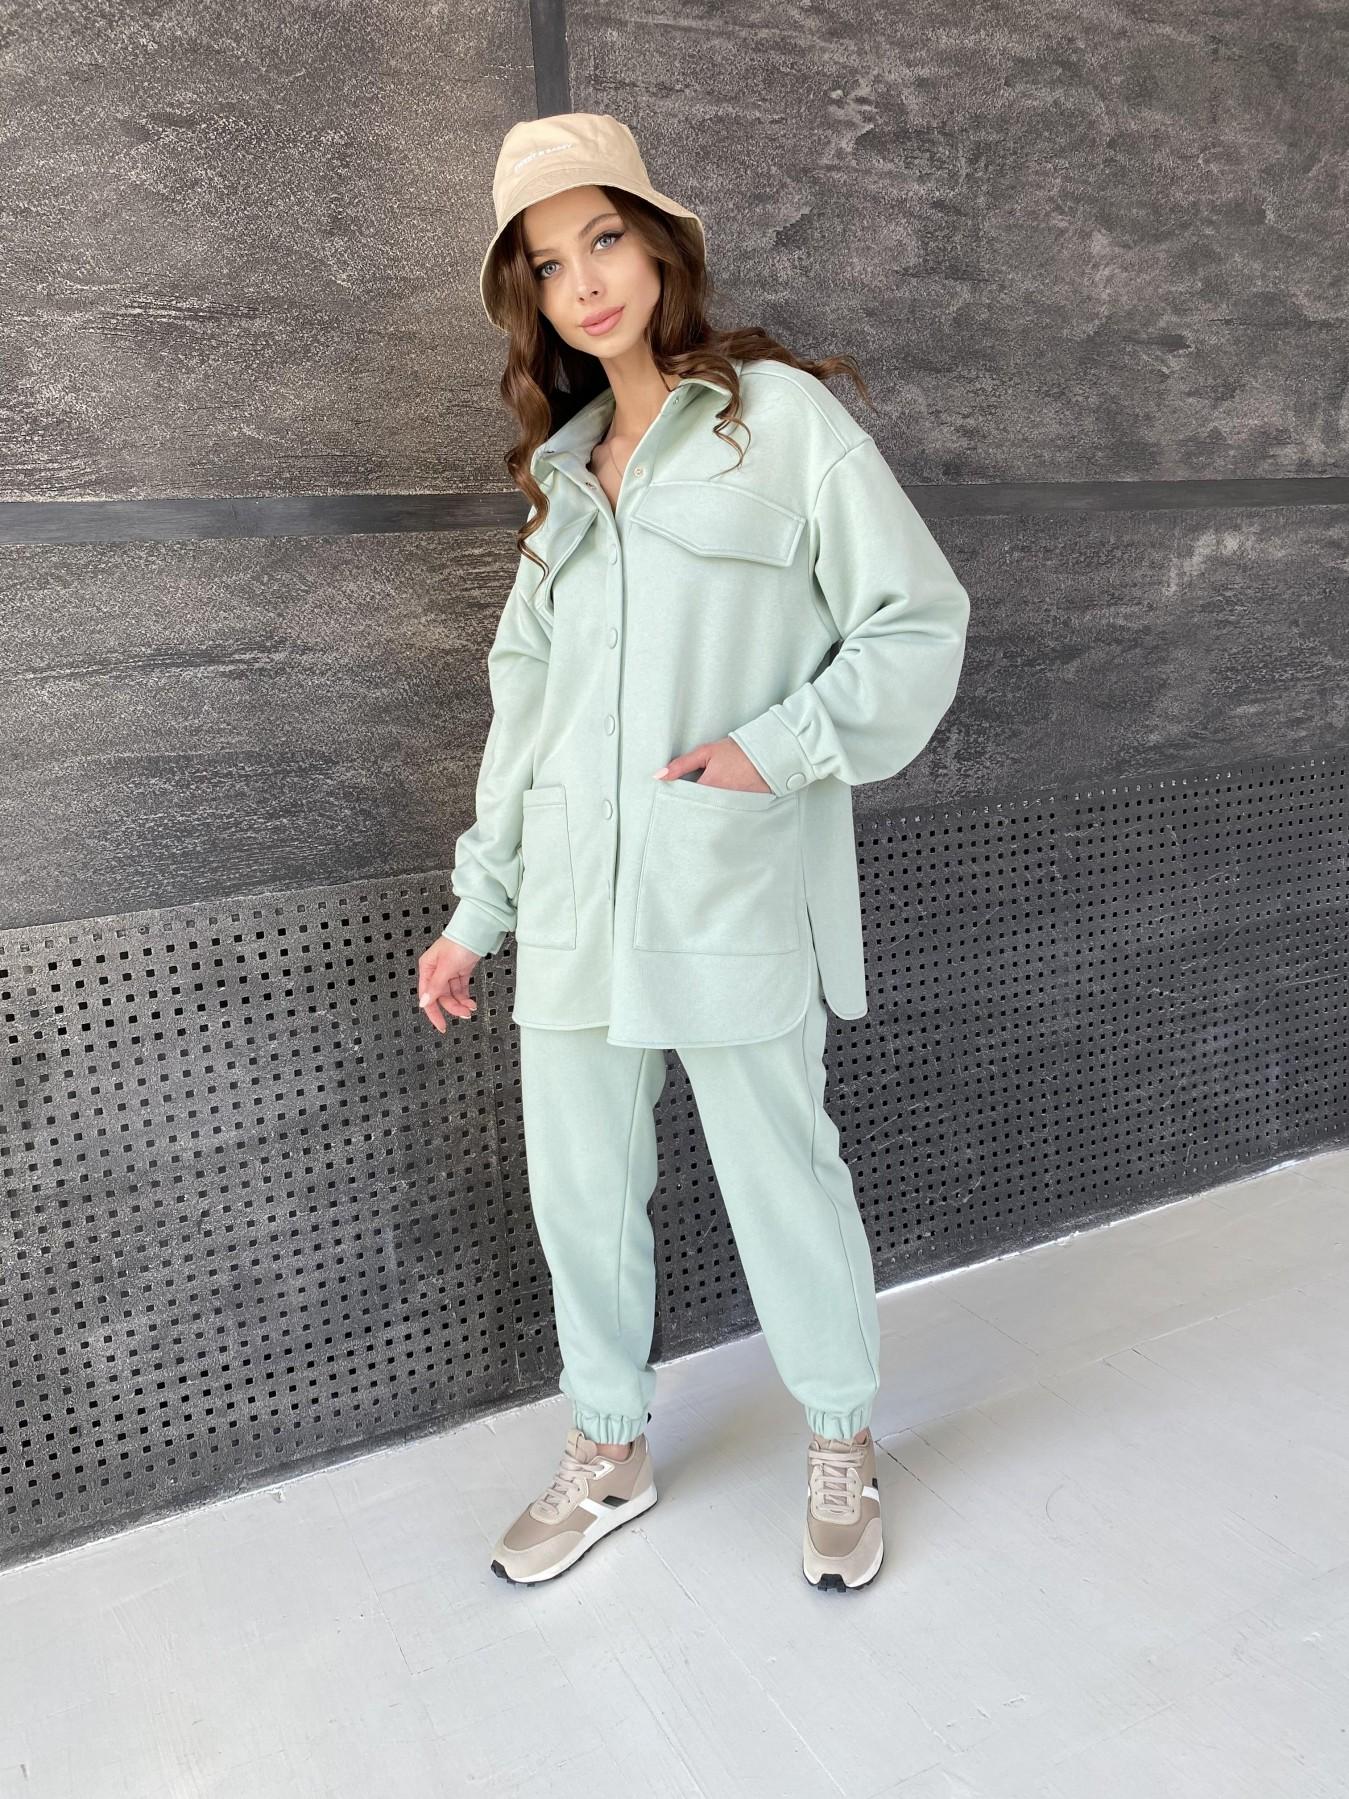 Респект костюм из трикотажа  3х нитка 11055 АРТ. 47576 Цвет: Олива Светлая - фото 9, интернет магазин tm-modus.ru